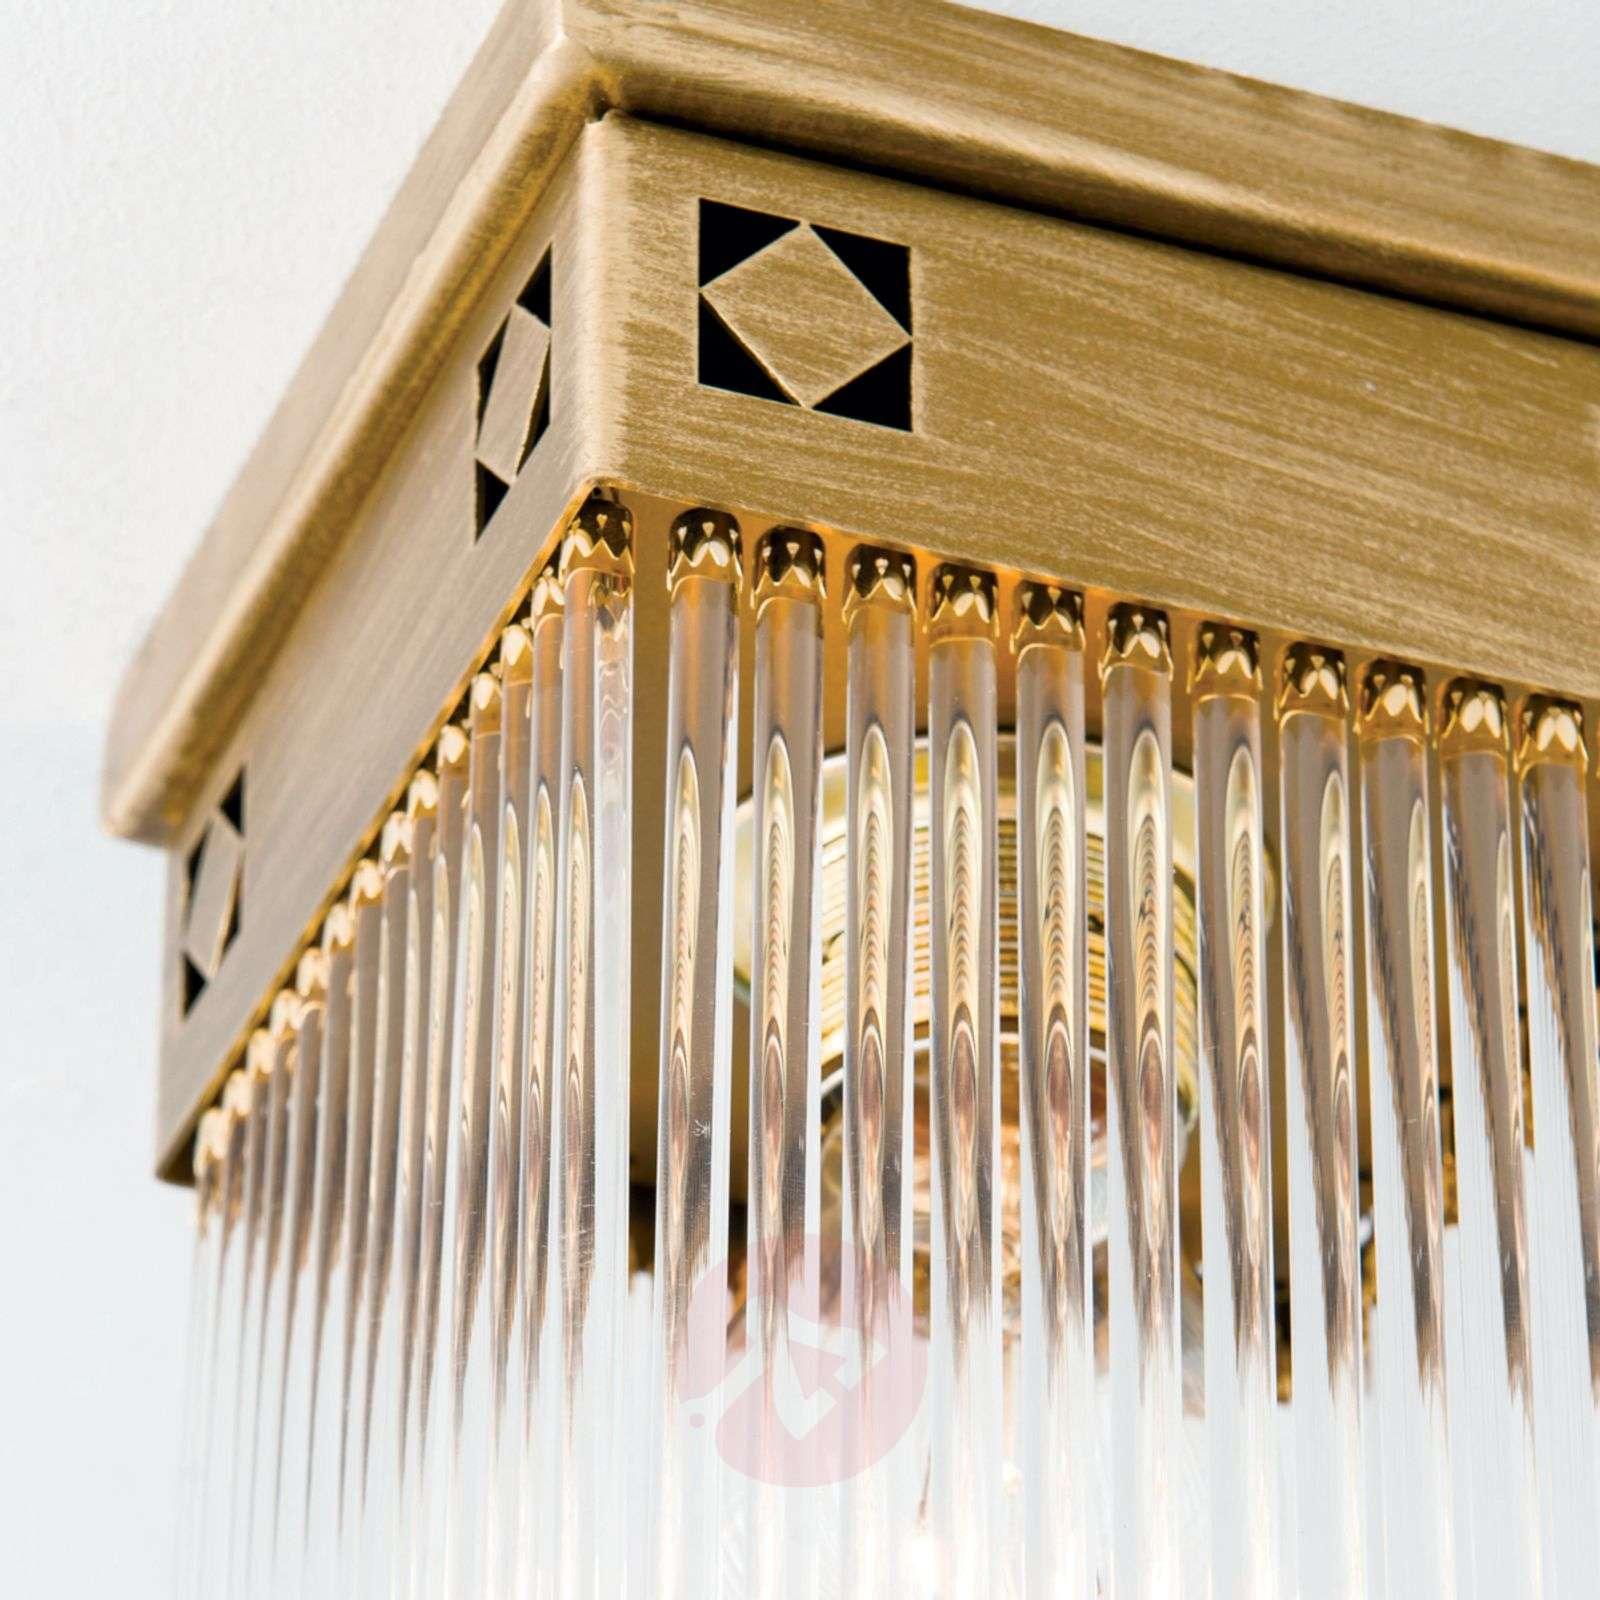 Art deco Frieda ceiling light, 1-bulb-7255203-01